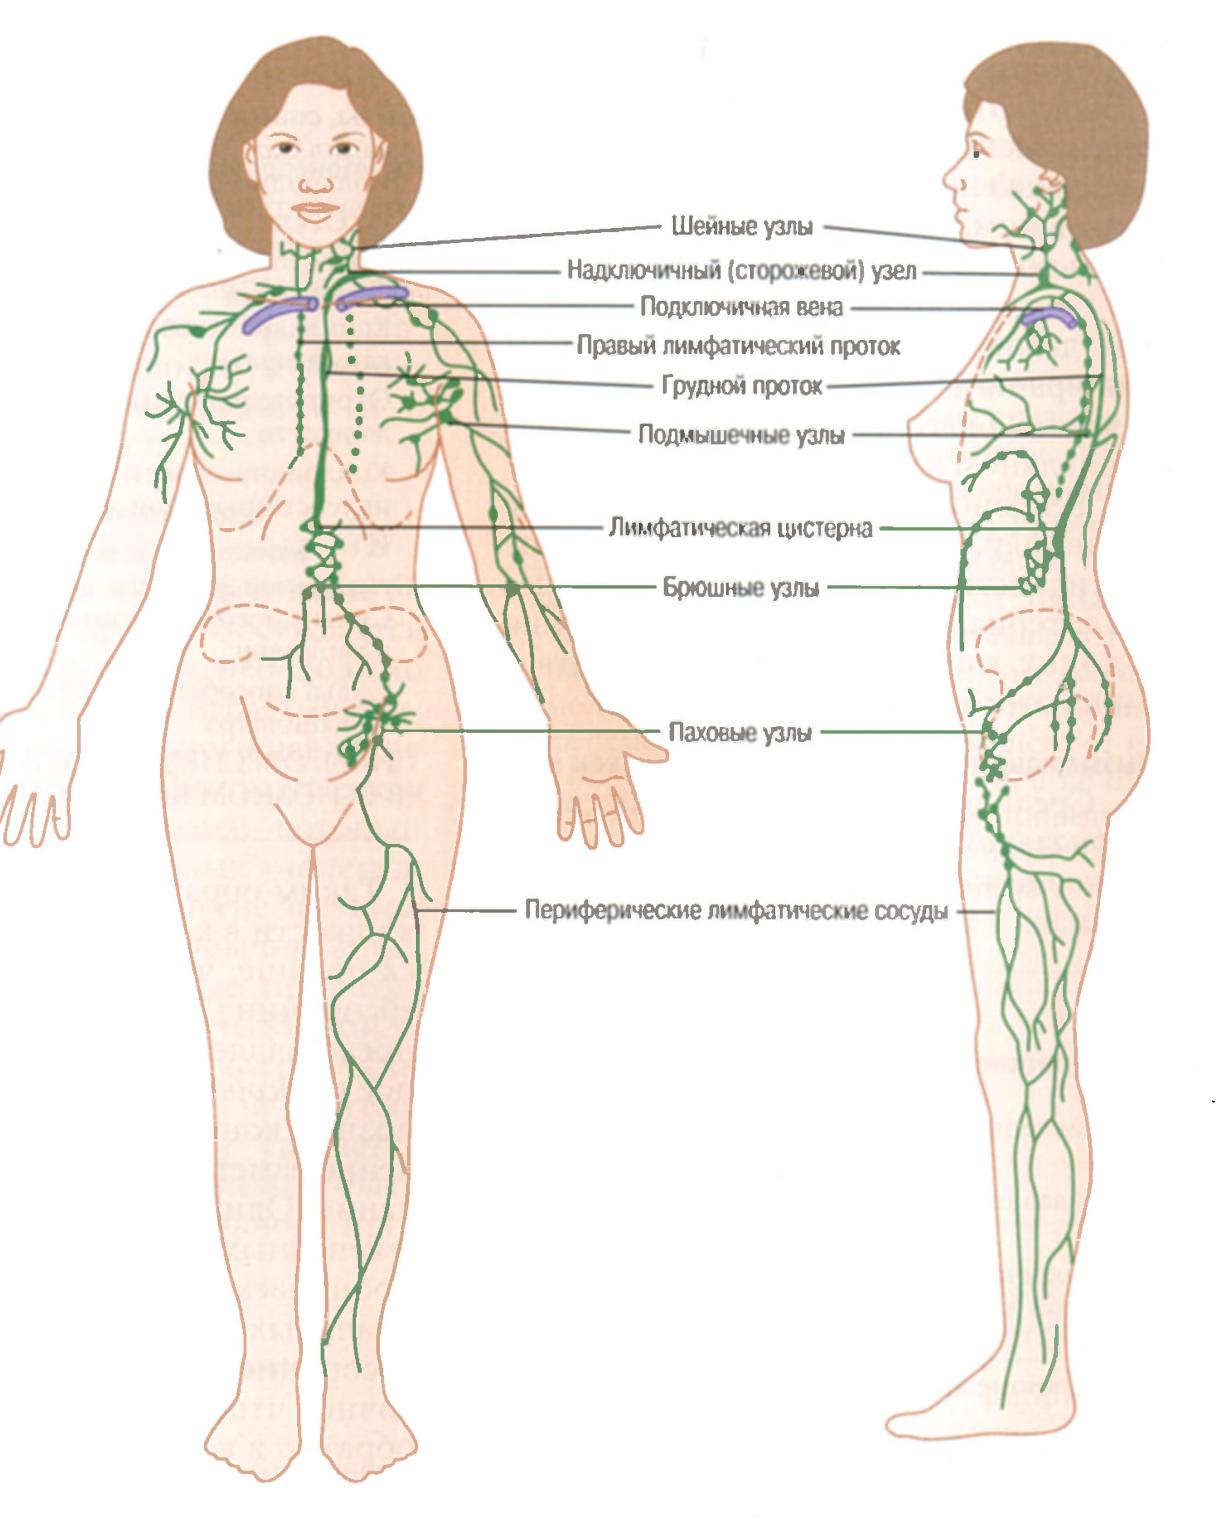 У человека более 500 лимфатических узлов